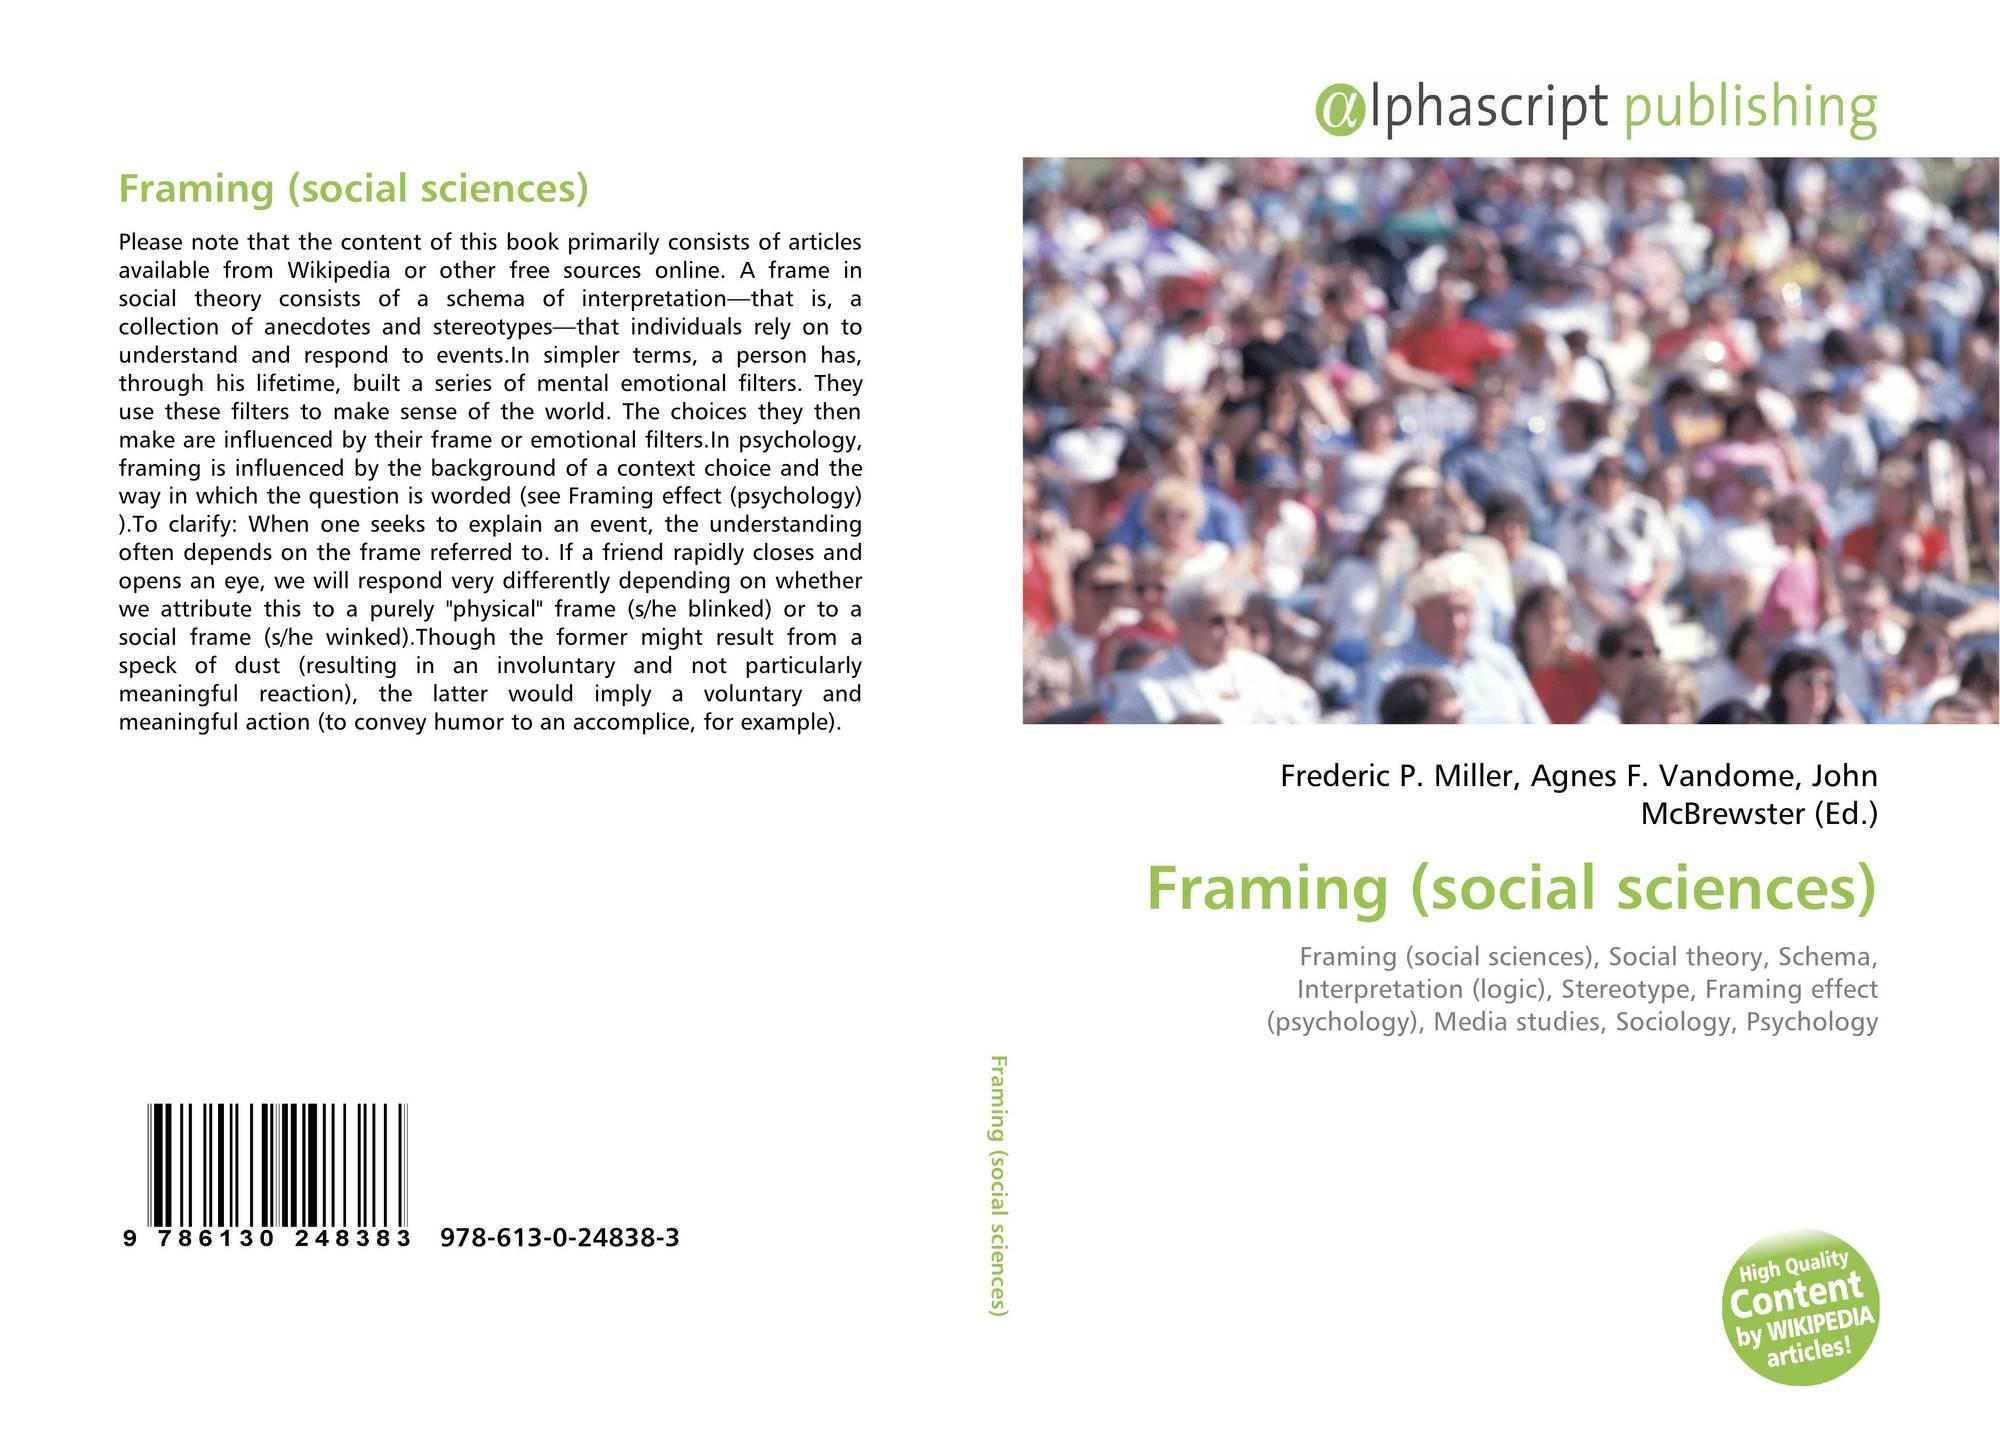 Framing (social sciences), 978-613-0-24838-3, 6130248385 ,9786130248383